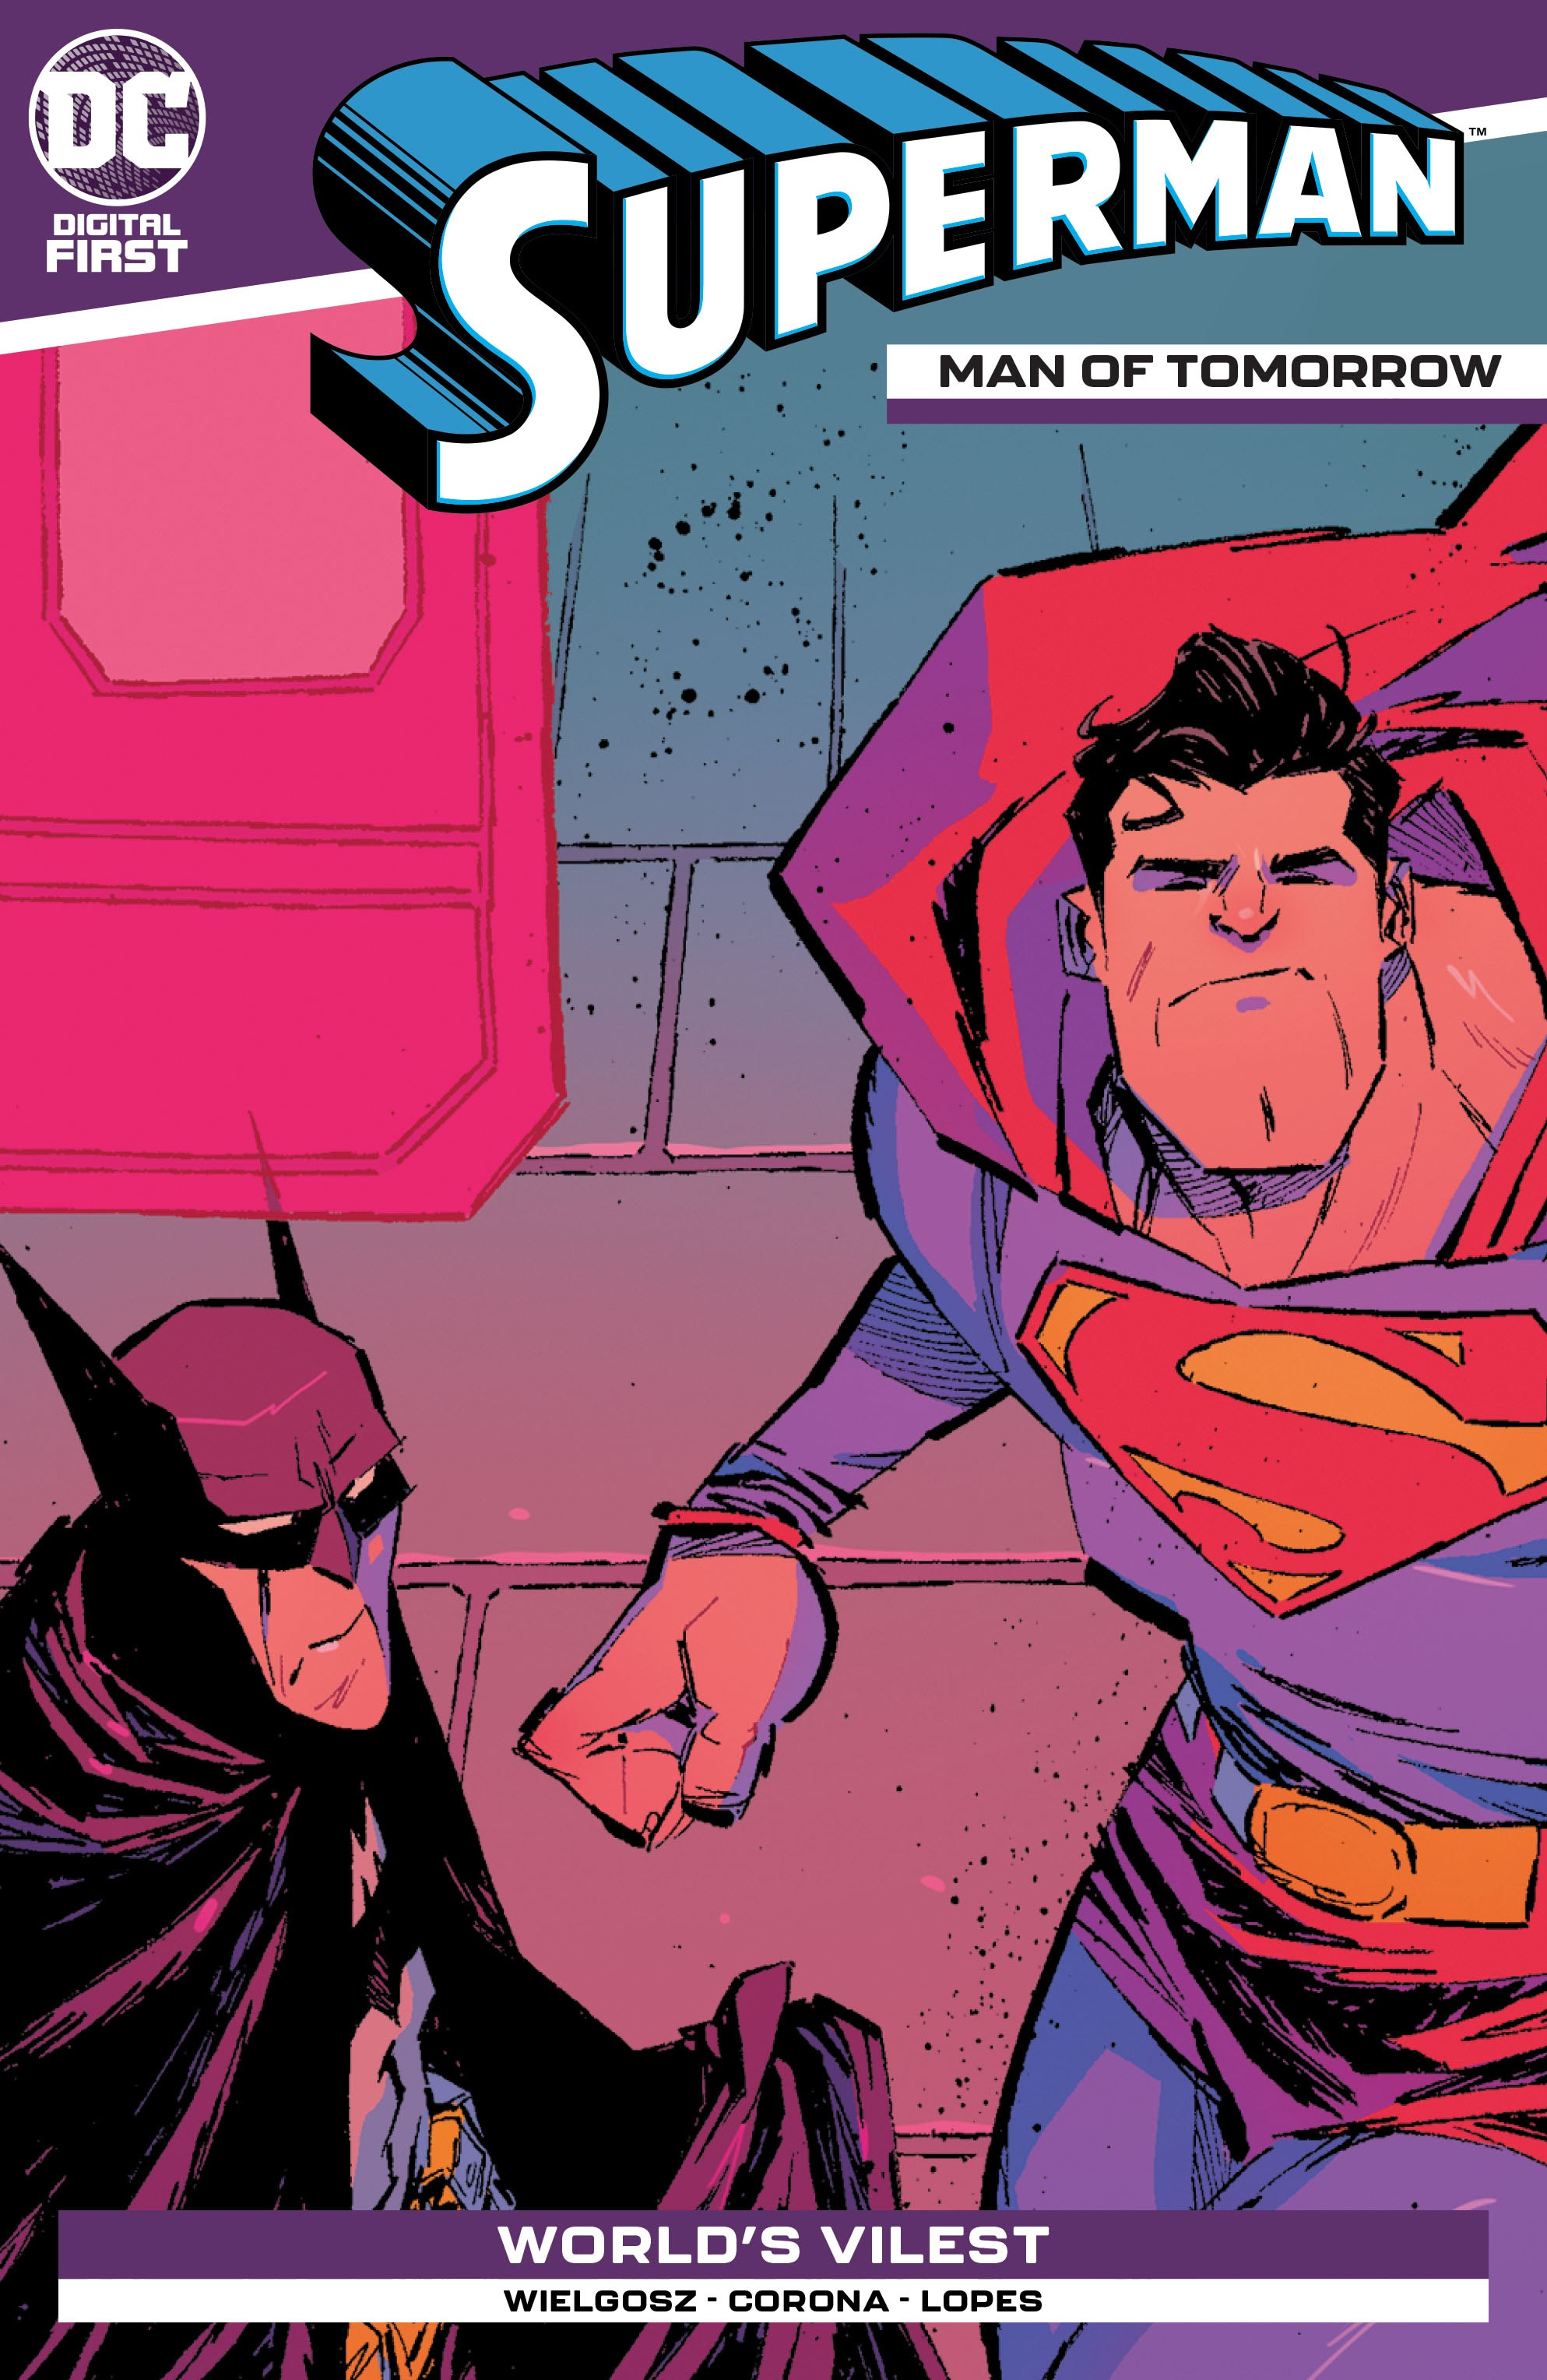 Superman: Man of Tomorrow Vol 1 19 (Digital)